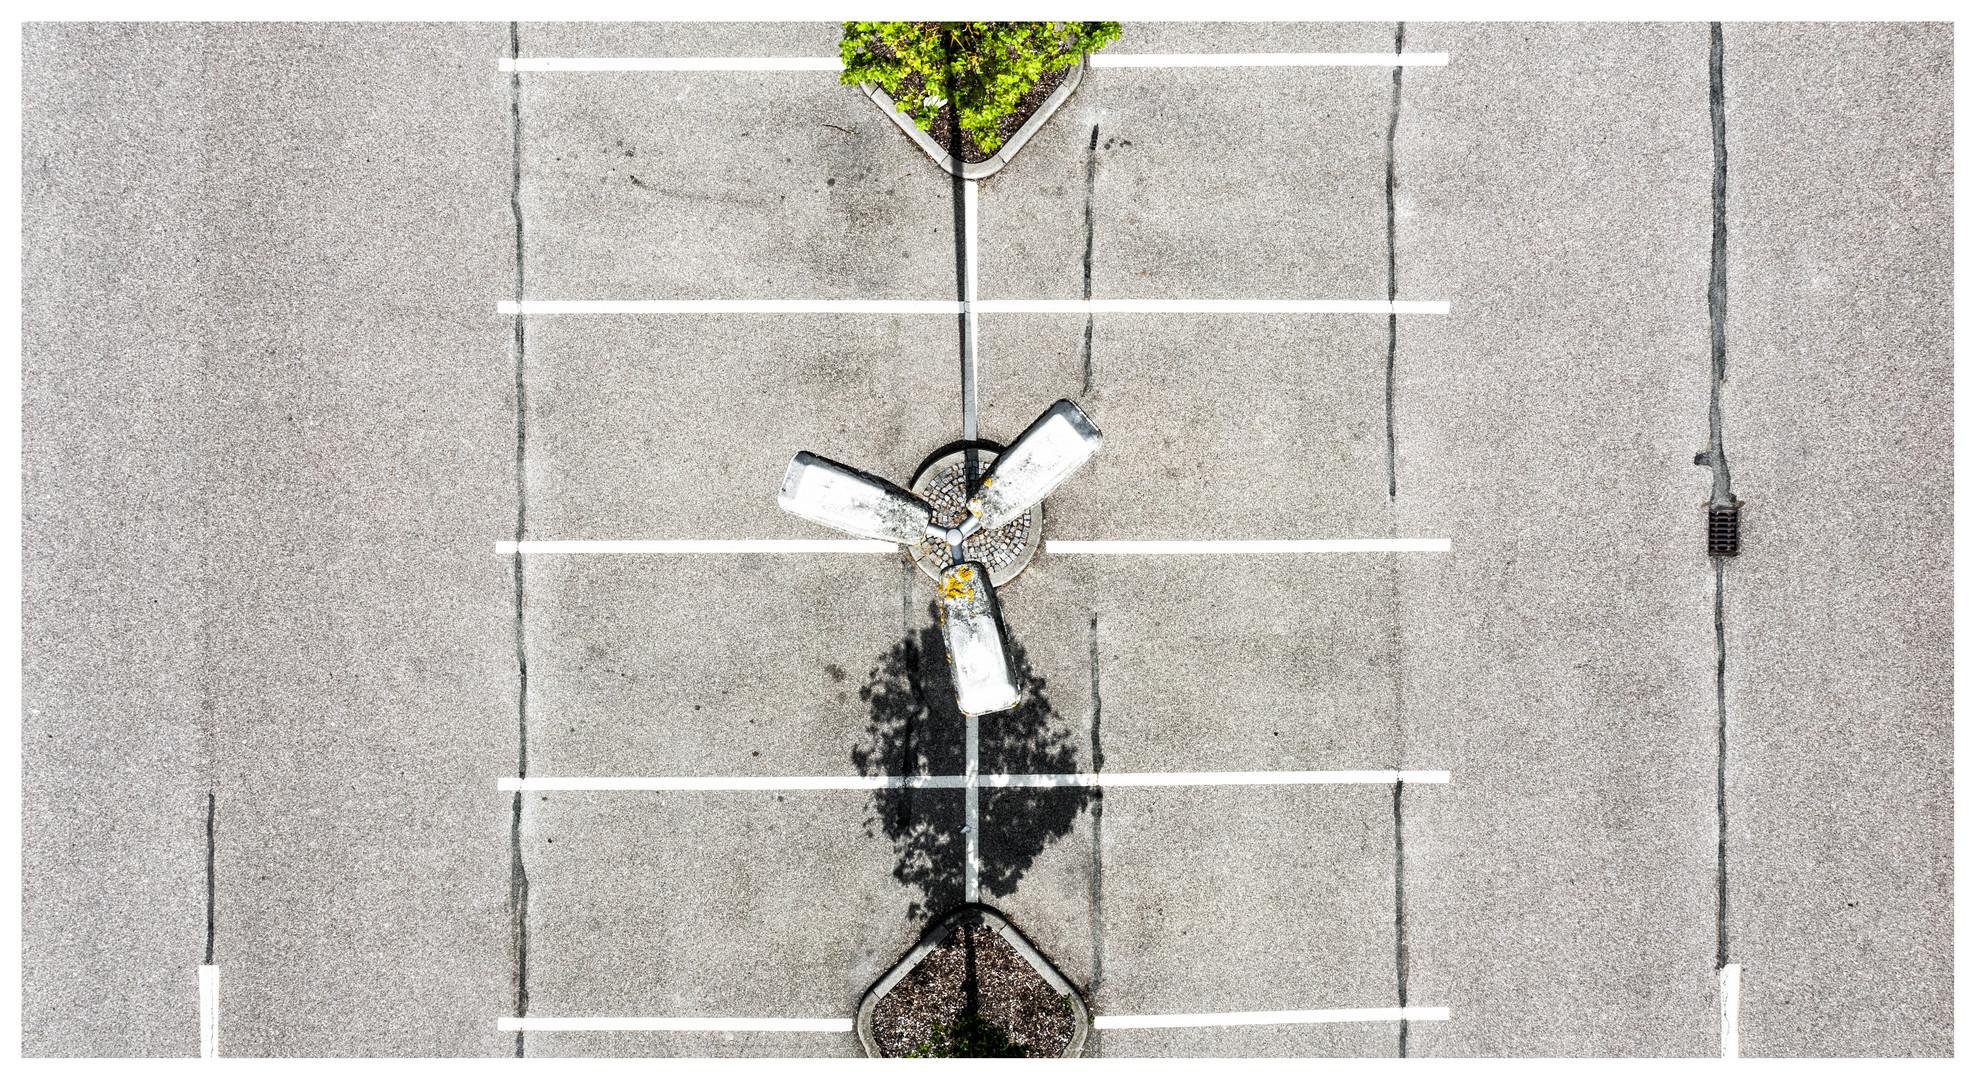 urban emptiness III